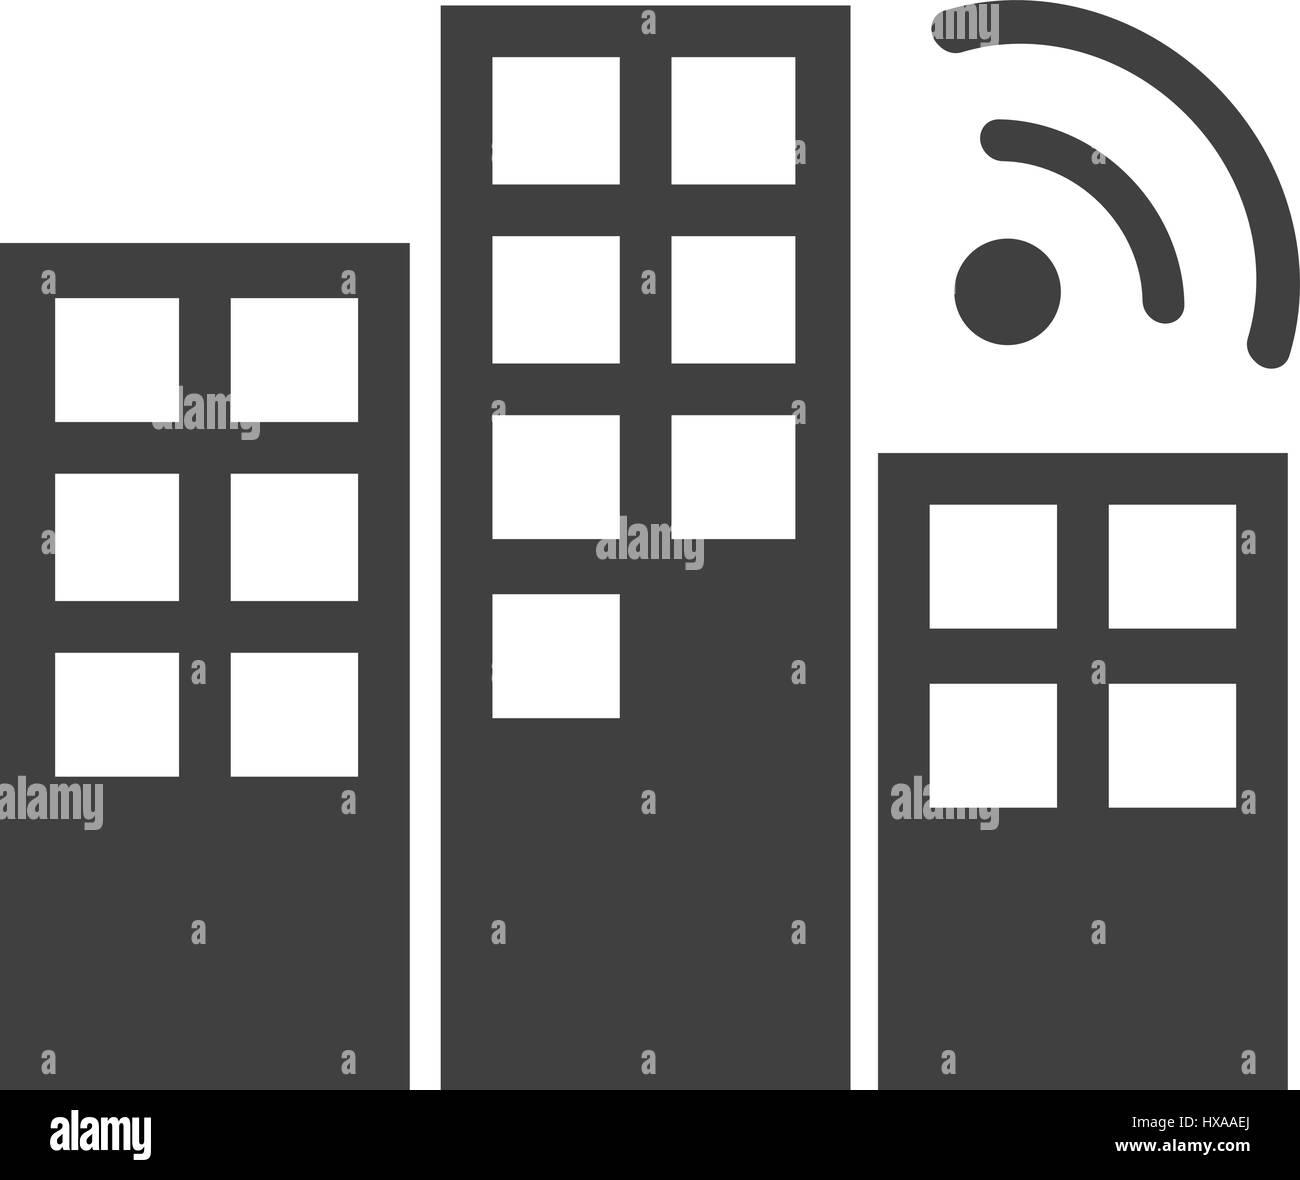 Diseño de conexión wi-fi Imagen De Stock